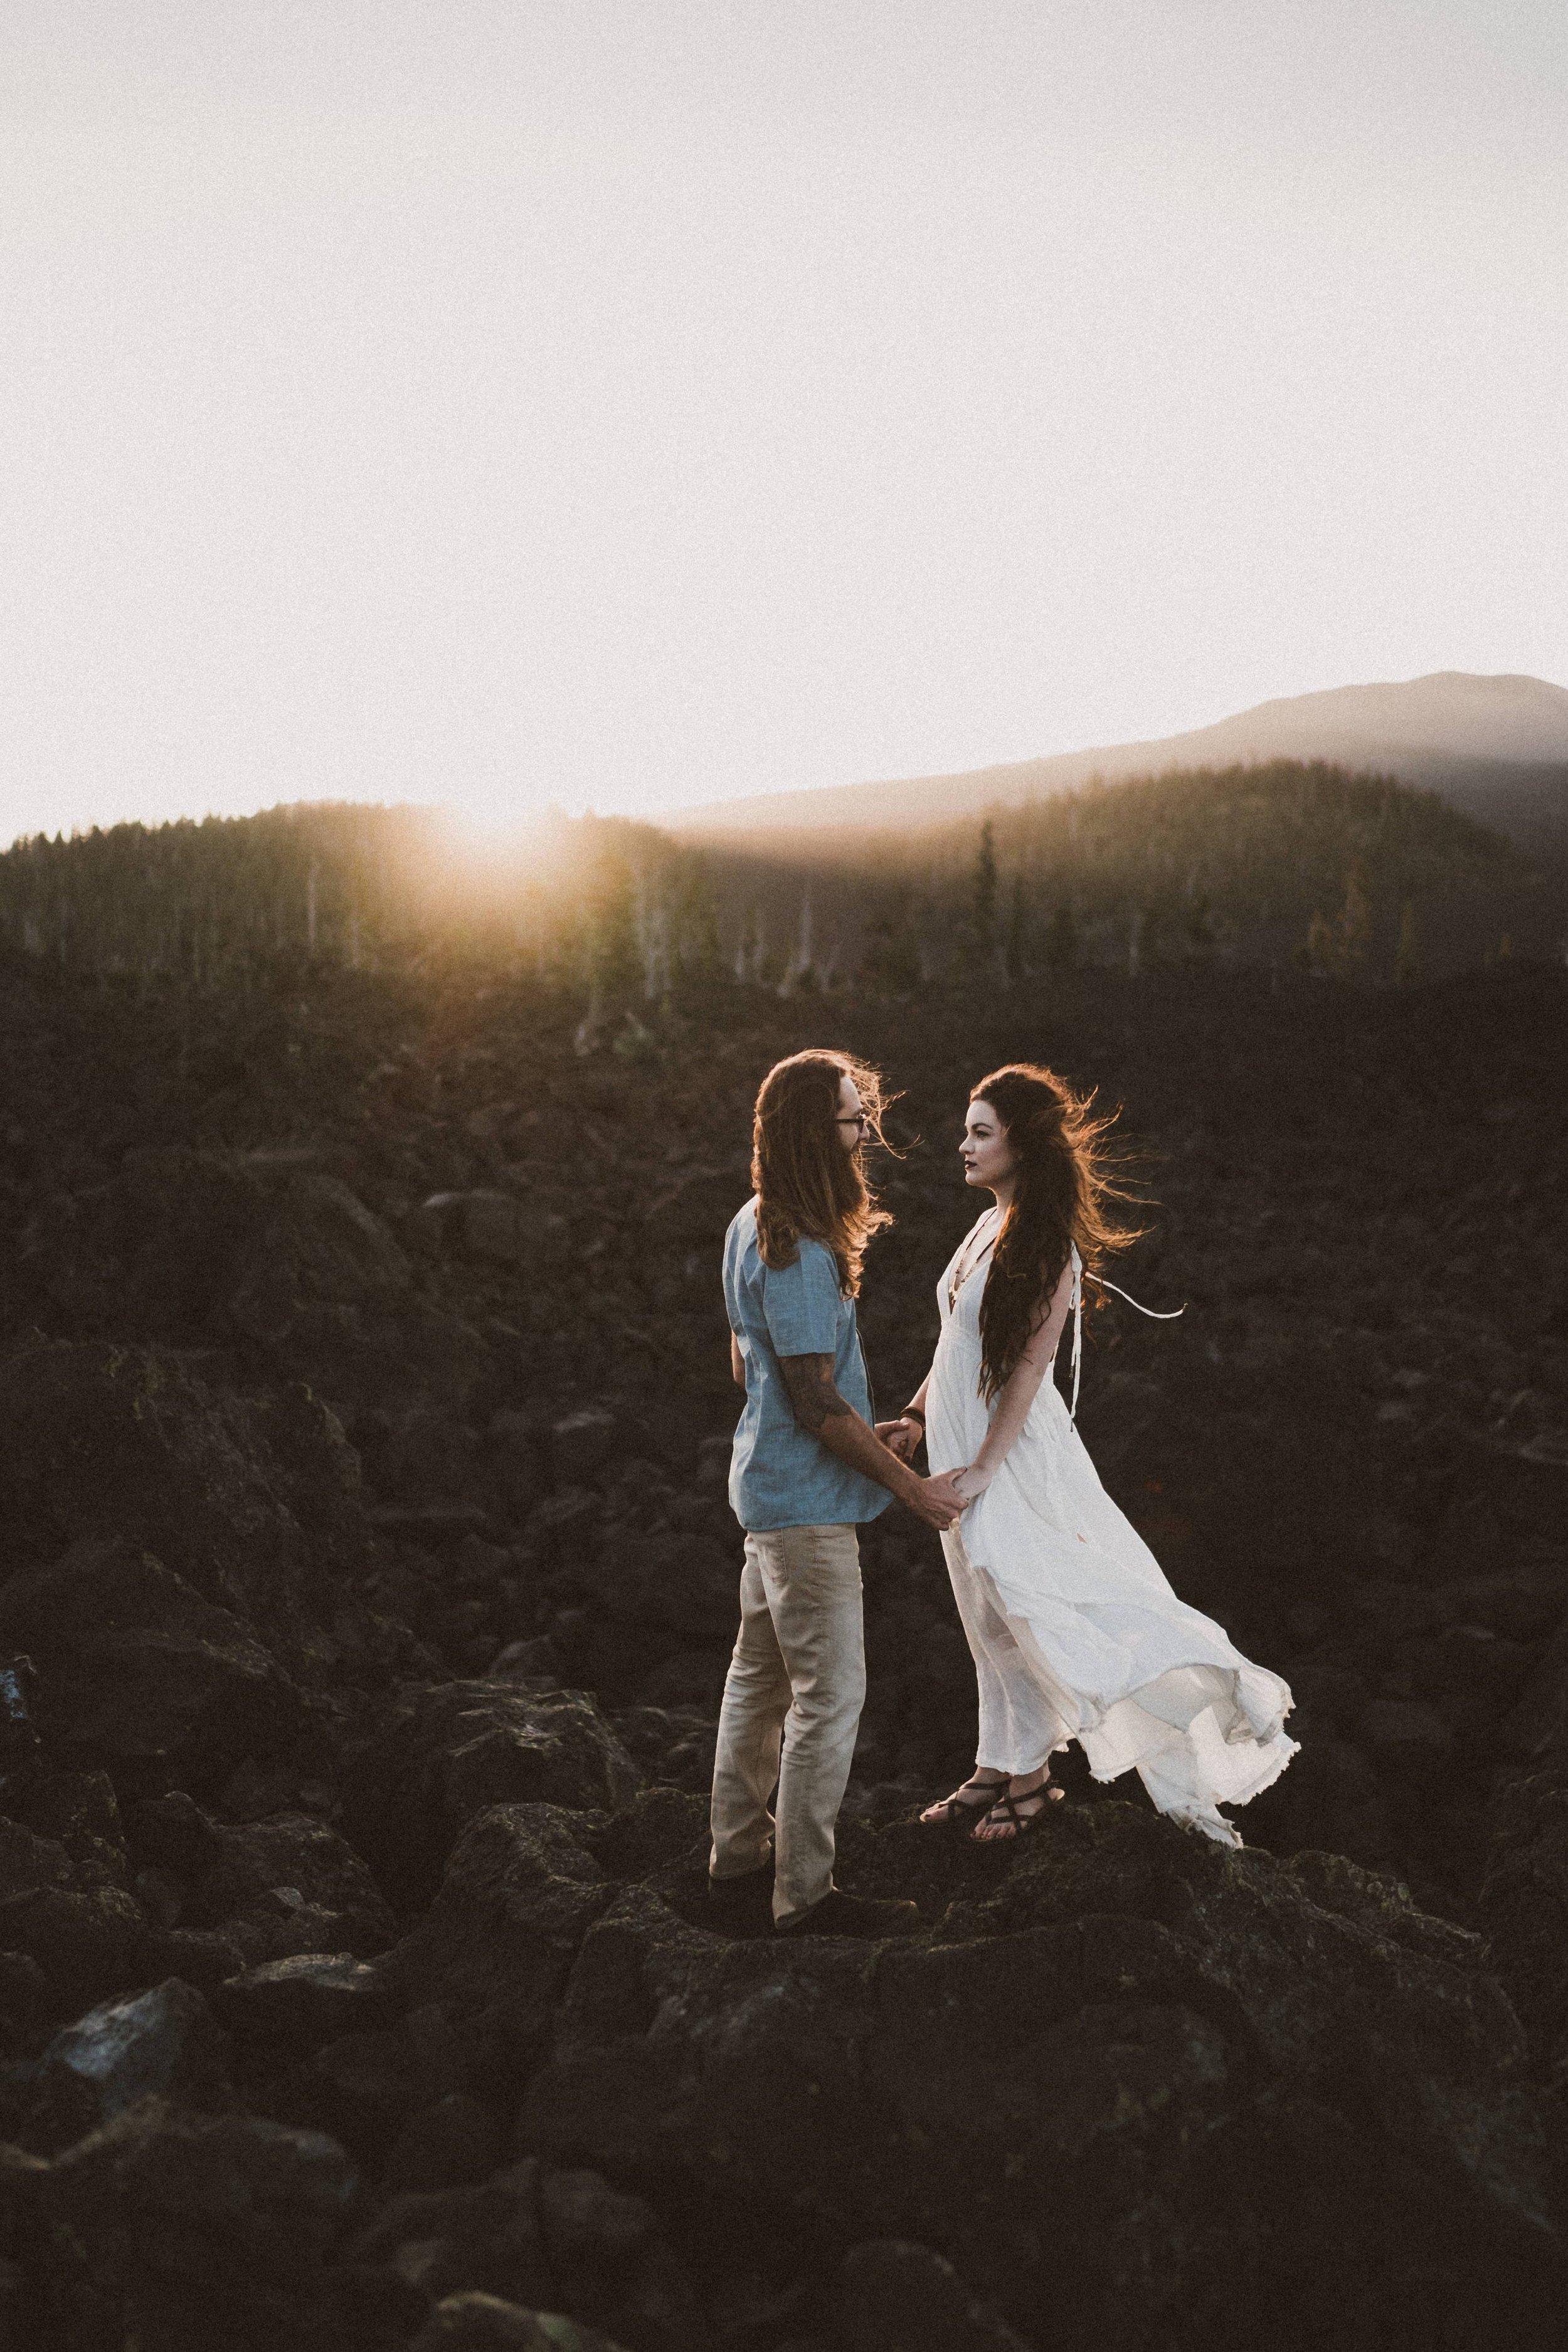 TONY-GAMBINO-BEND-OREGON-TRAVELING-WEDDING-PHOTOGRAPHER-CASCADES-ENGAGEMENT_1470.jpg